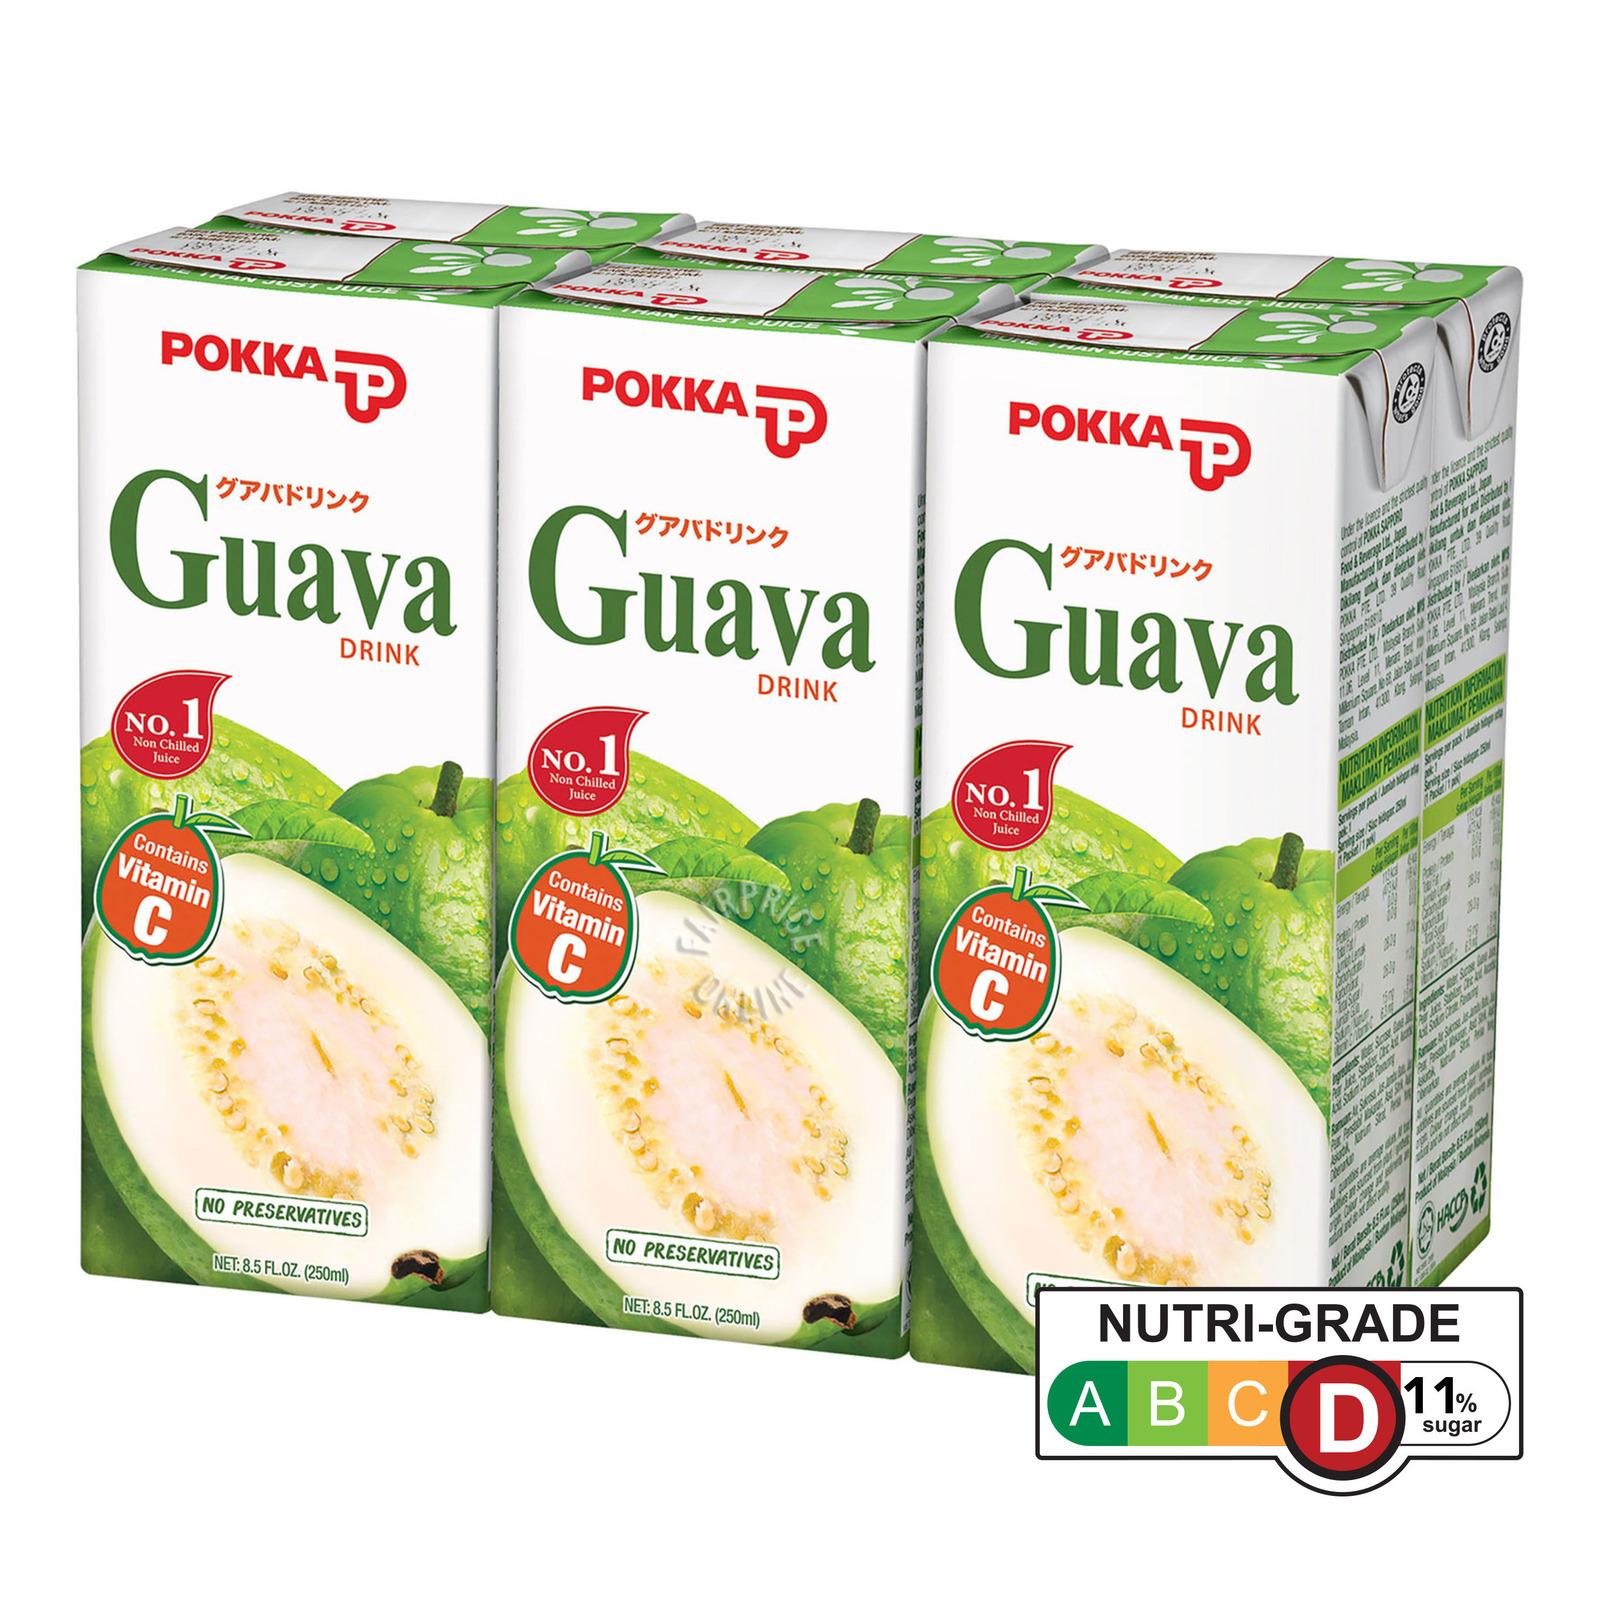 Pokka Soya Bean Drink (6 x 250ML)